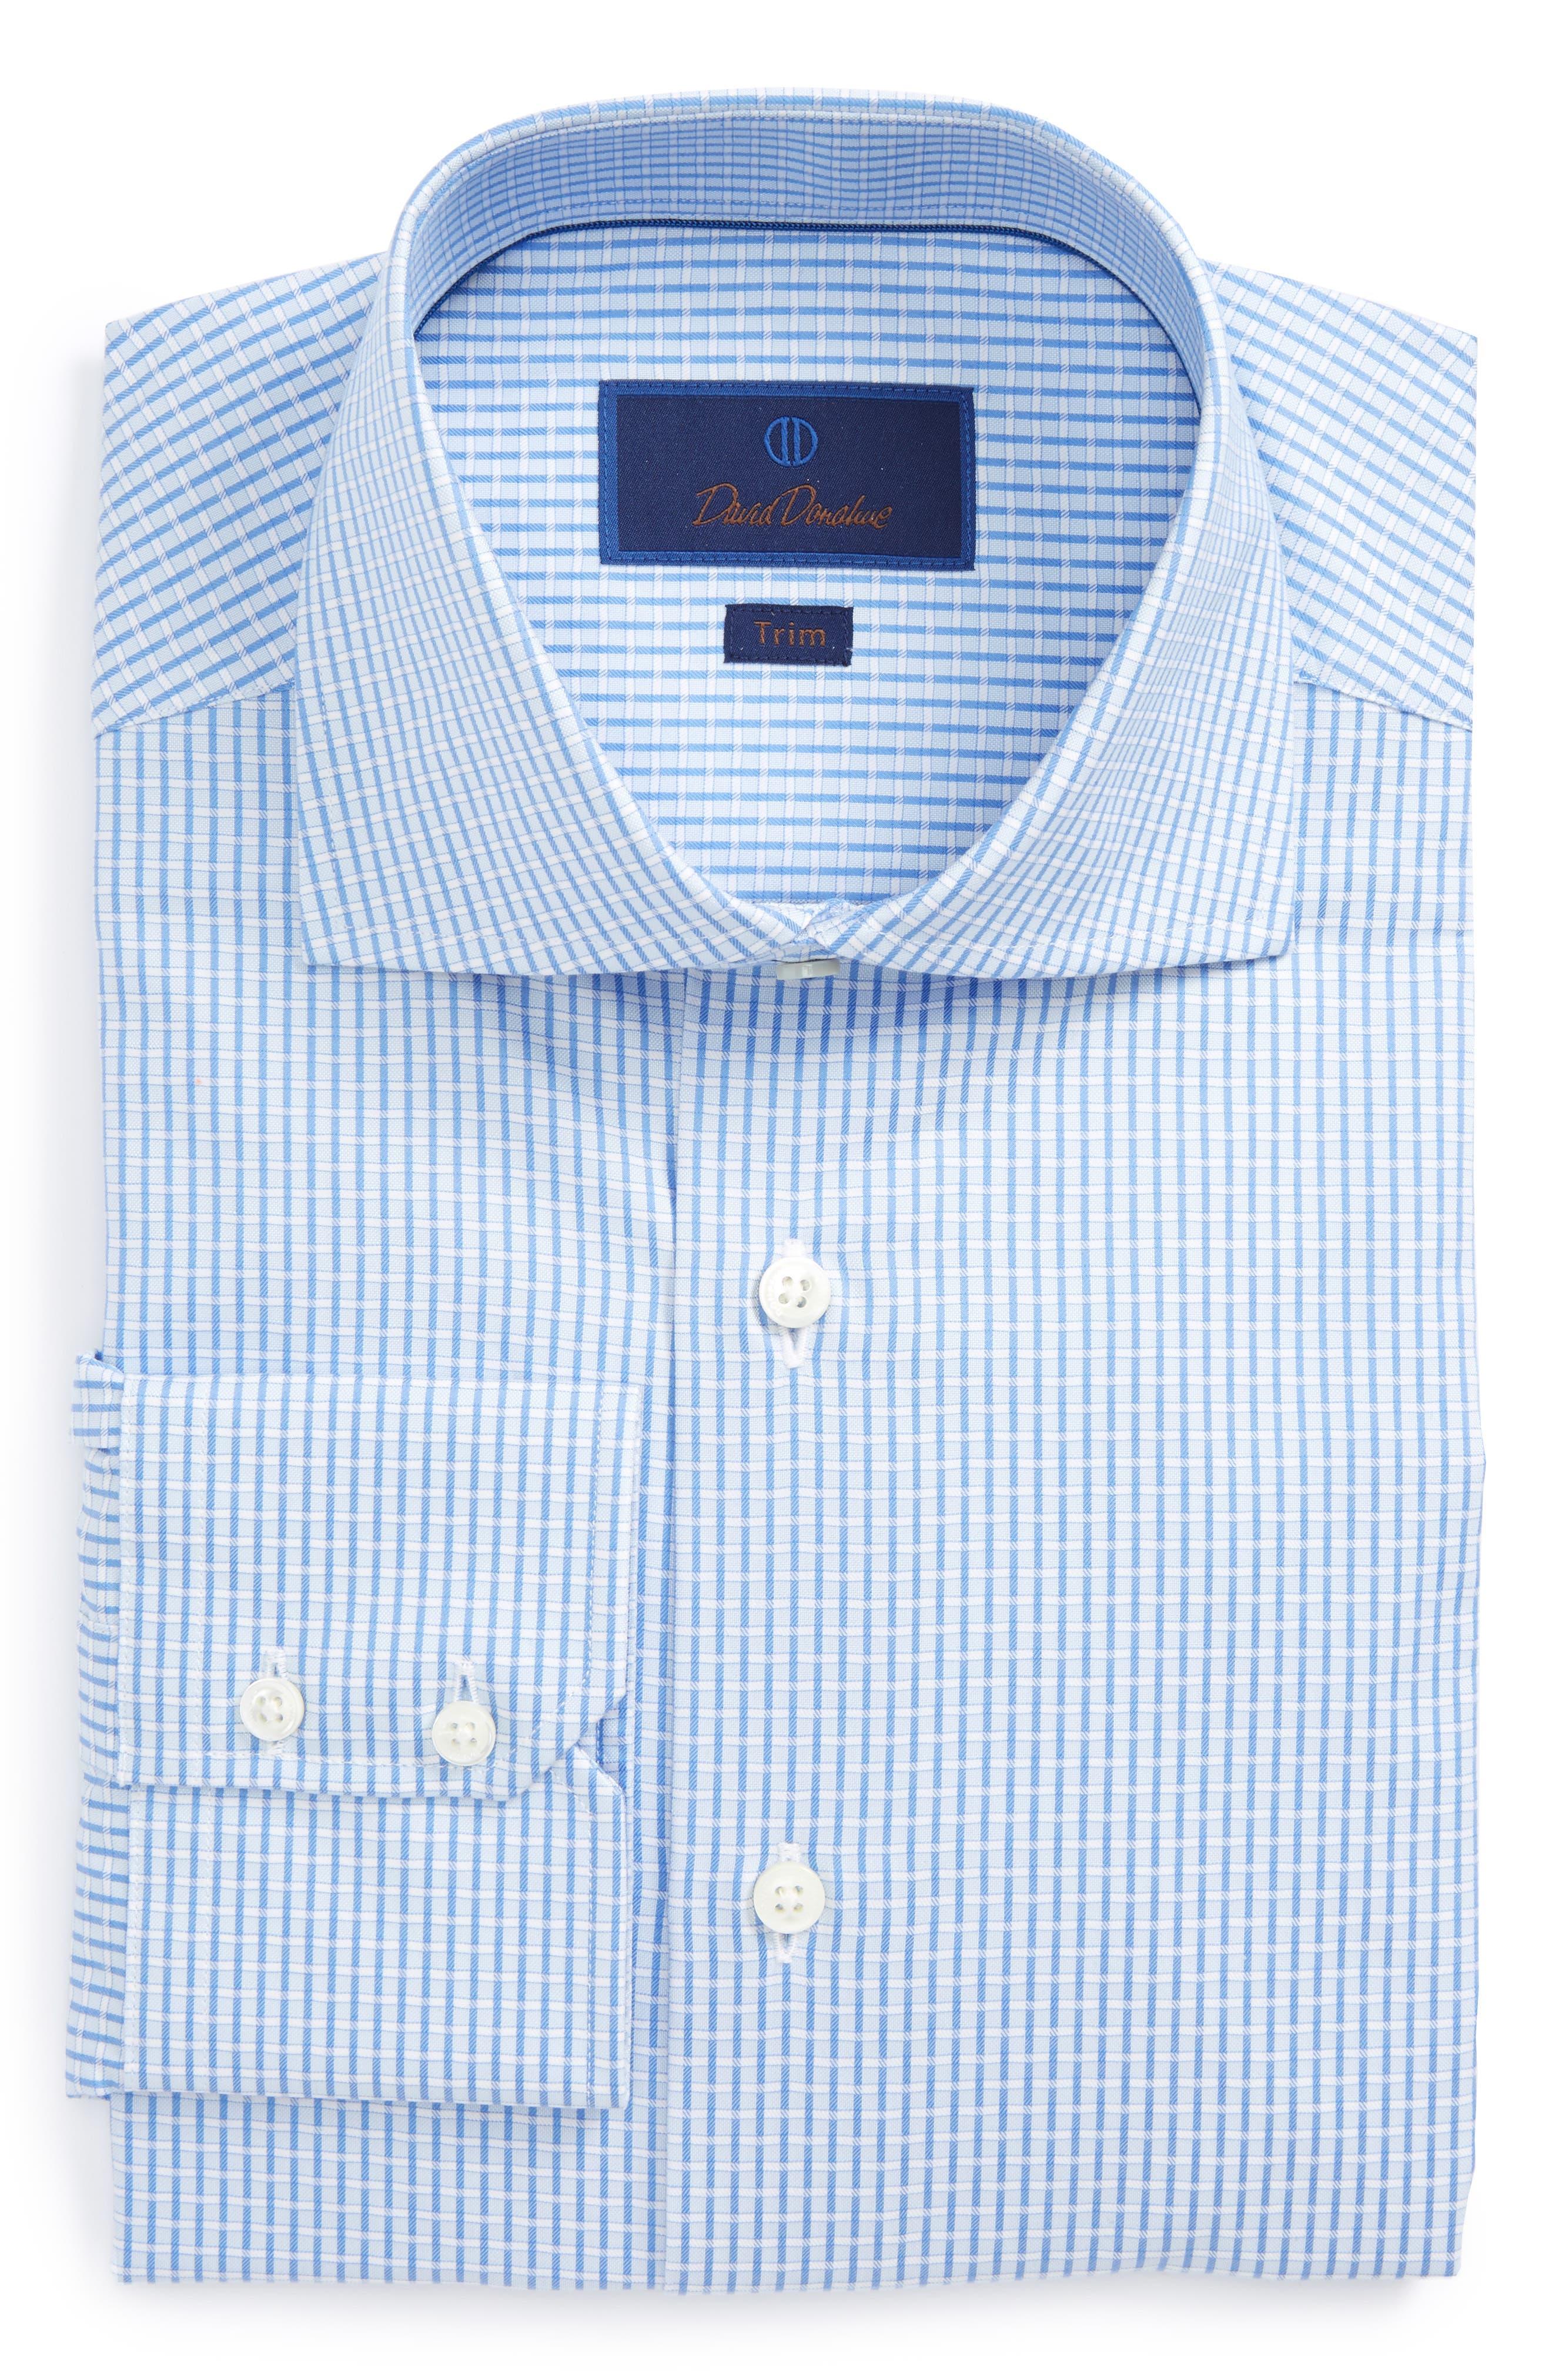 David Donahue Trim Fit Box Weave Dress Shirt